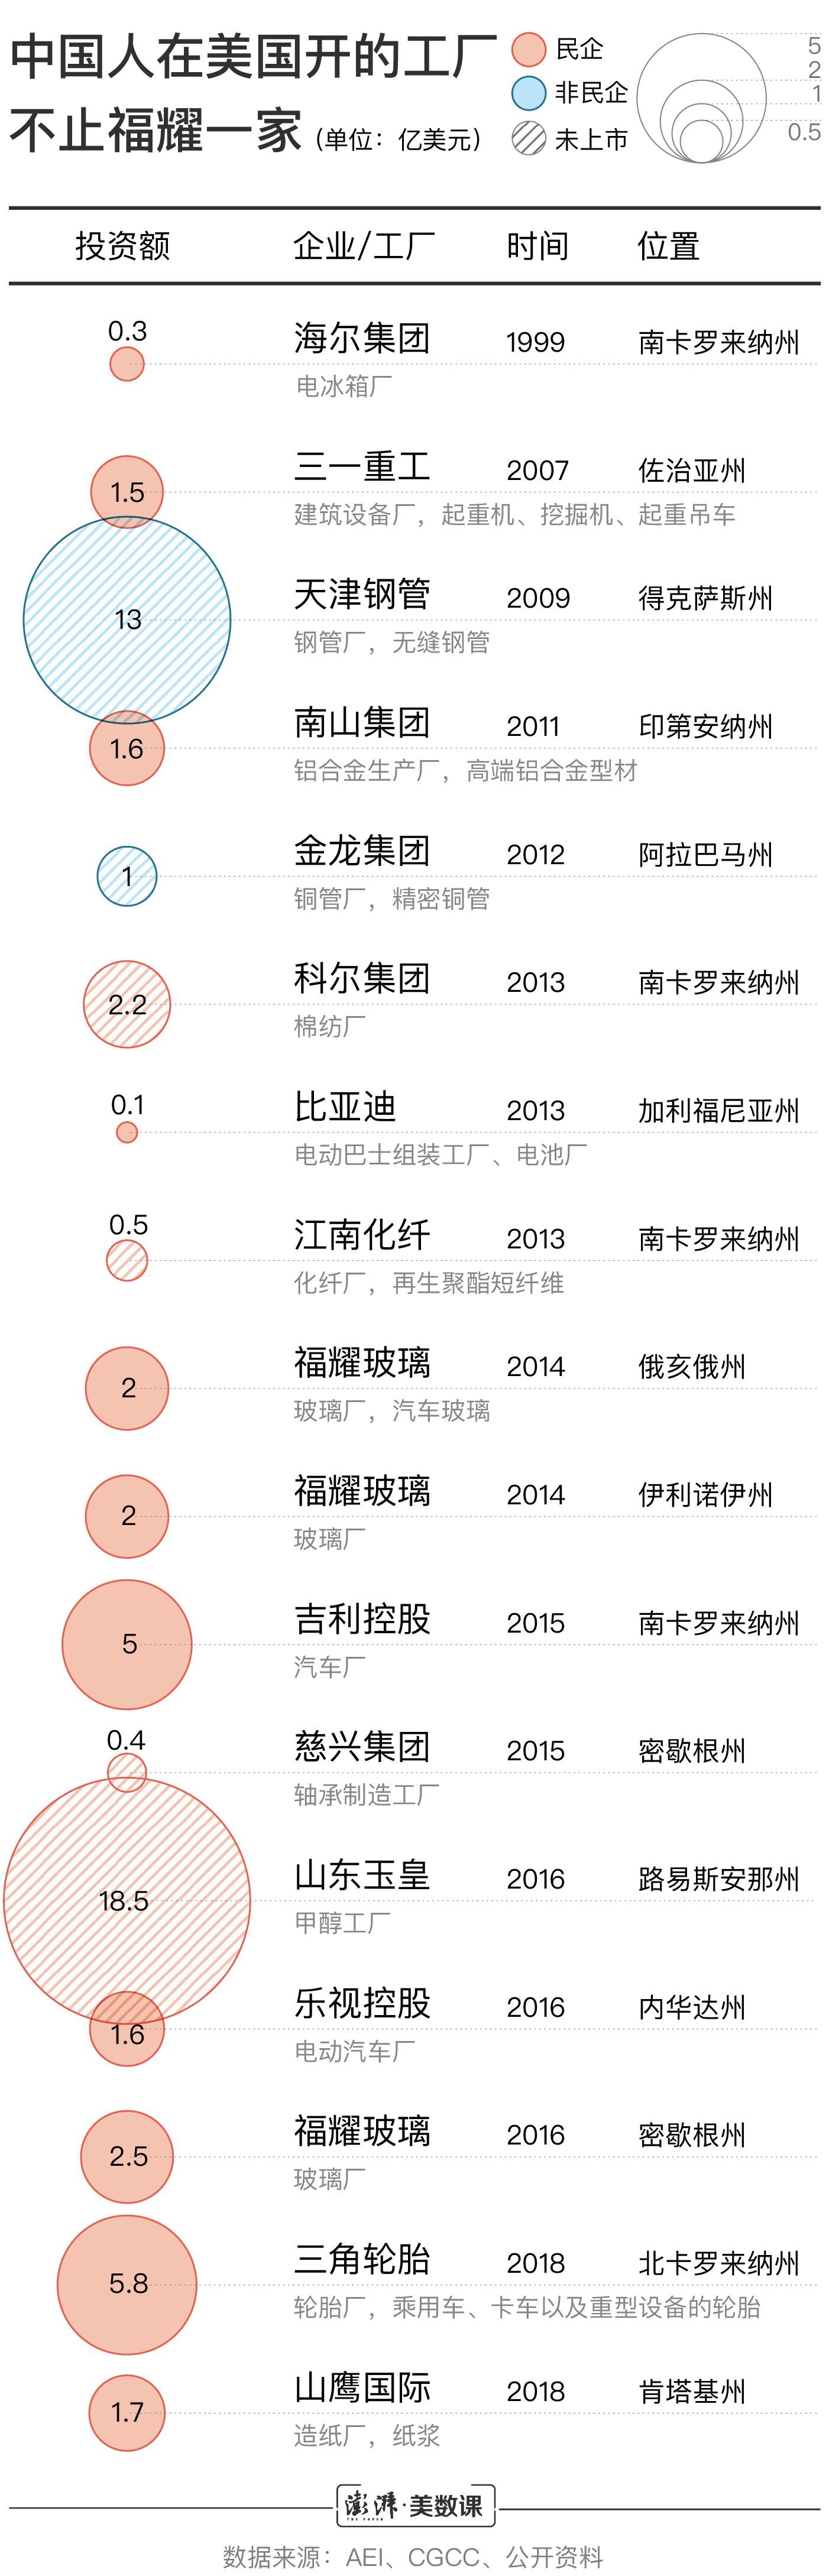 http://www.hljold.org.cn/caijingguanzhu/250140.html